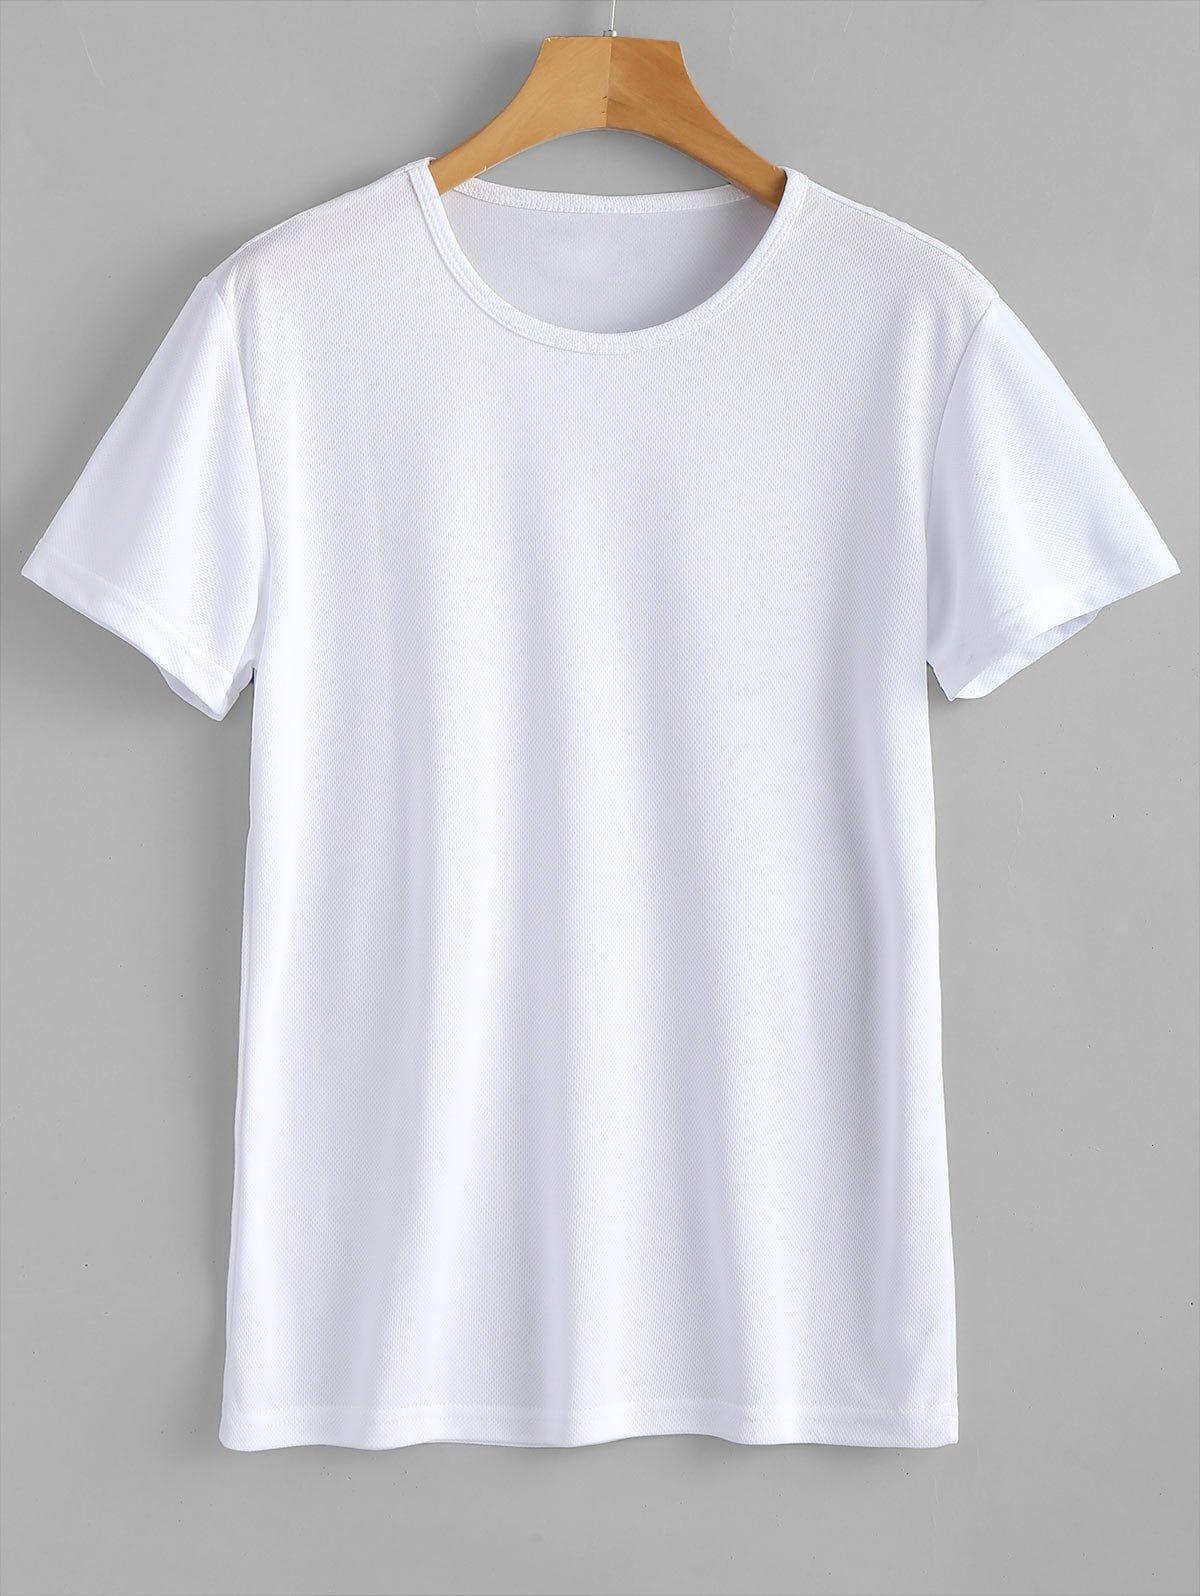 Waterproof Eyelet Sport T Shirt Black White Affiliate Sport Eyelet Waterproof White Black Ad Baju Kaos Baju Sweter Gaya Model Pakaian Korea